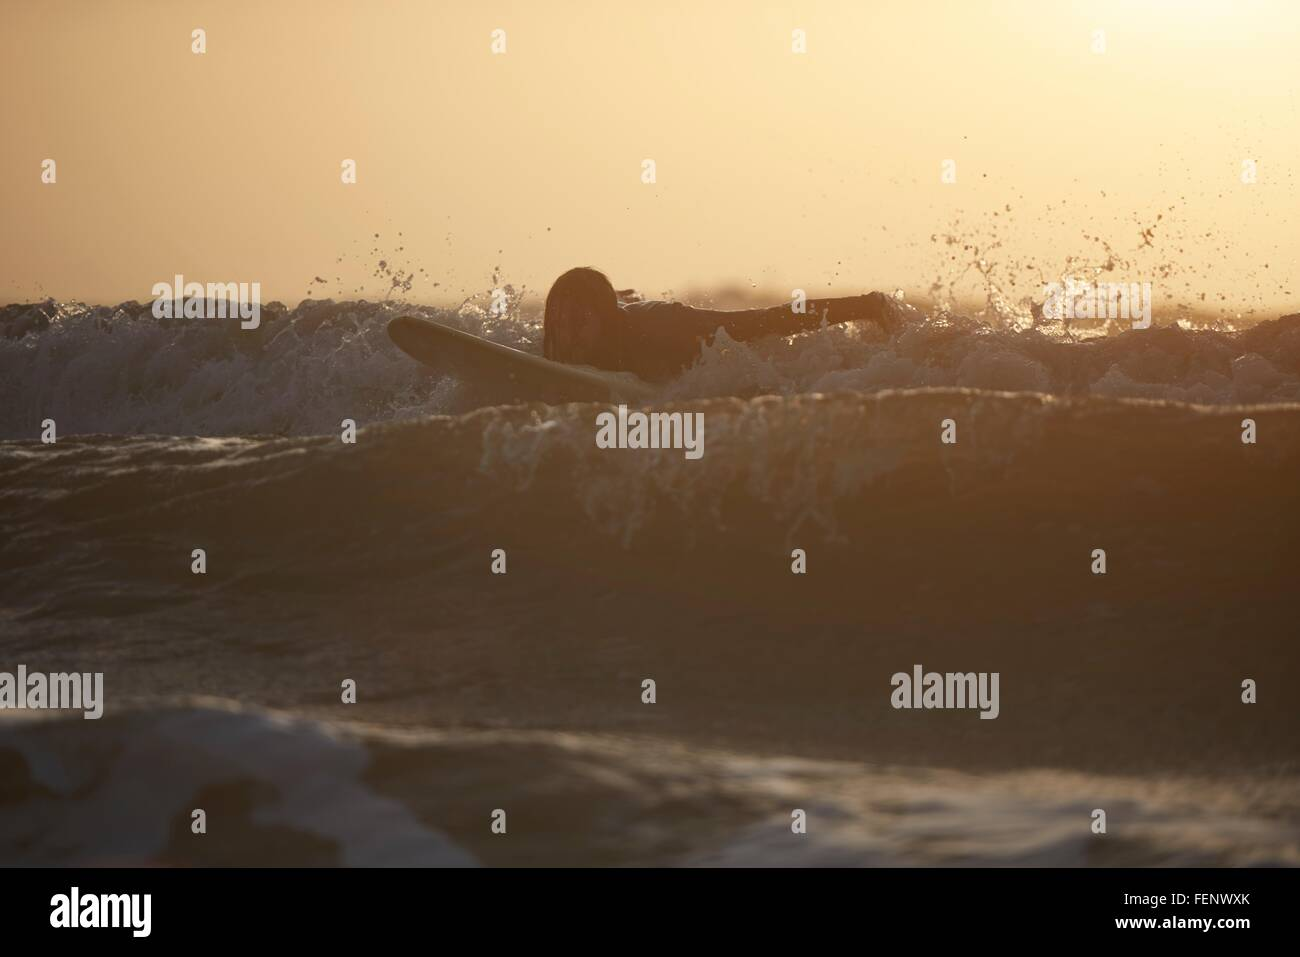 Silueta de macho joven surfista surf en mar, Devon, Inglaterra, Reino Unido. Imagen De Stock